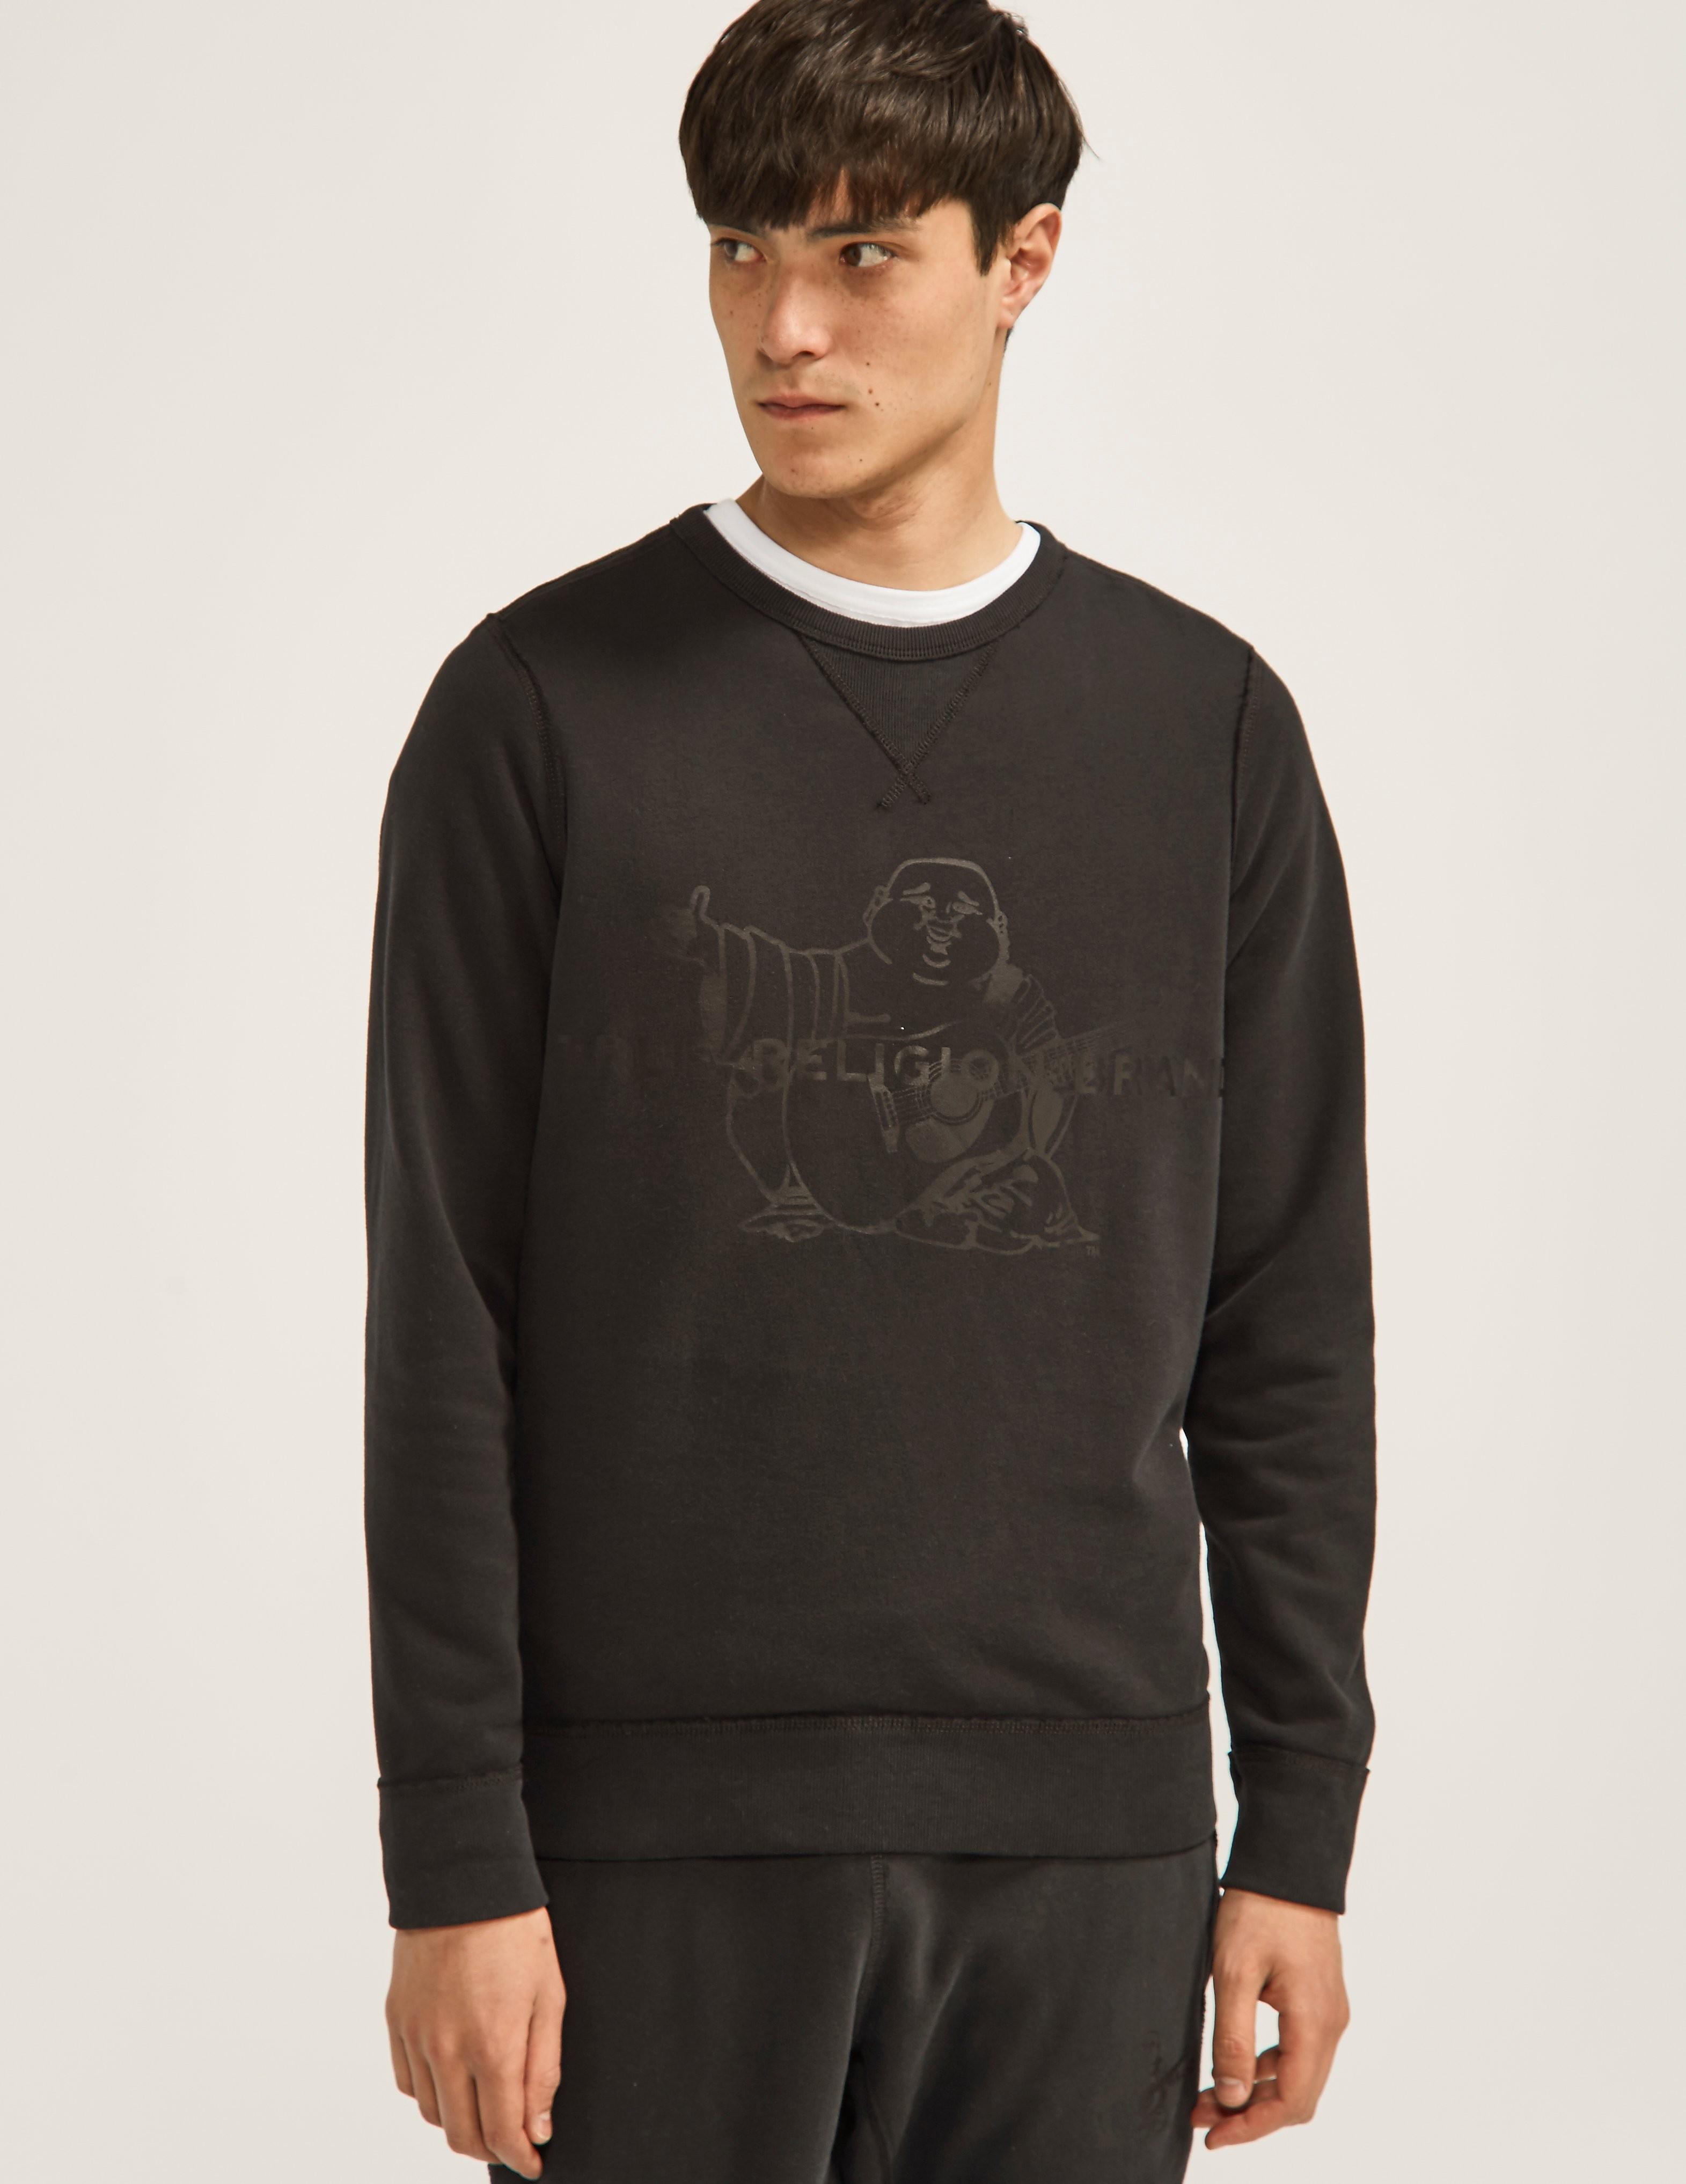 True Religion Tonal Buddah Sweatshirt